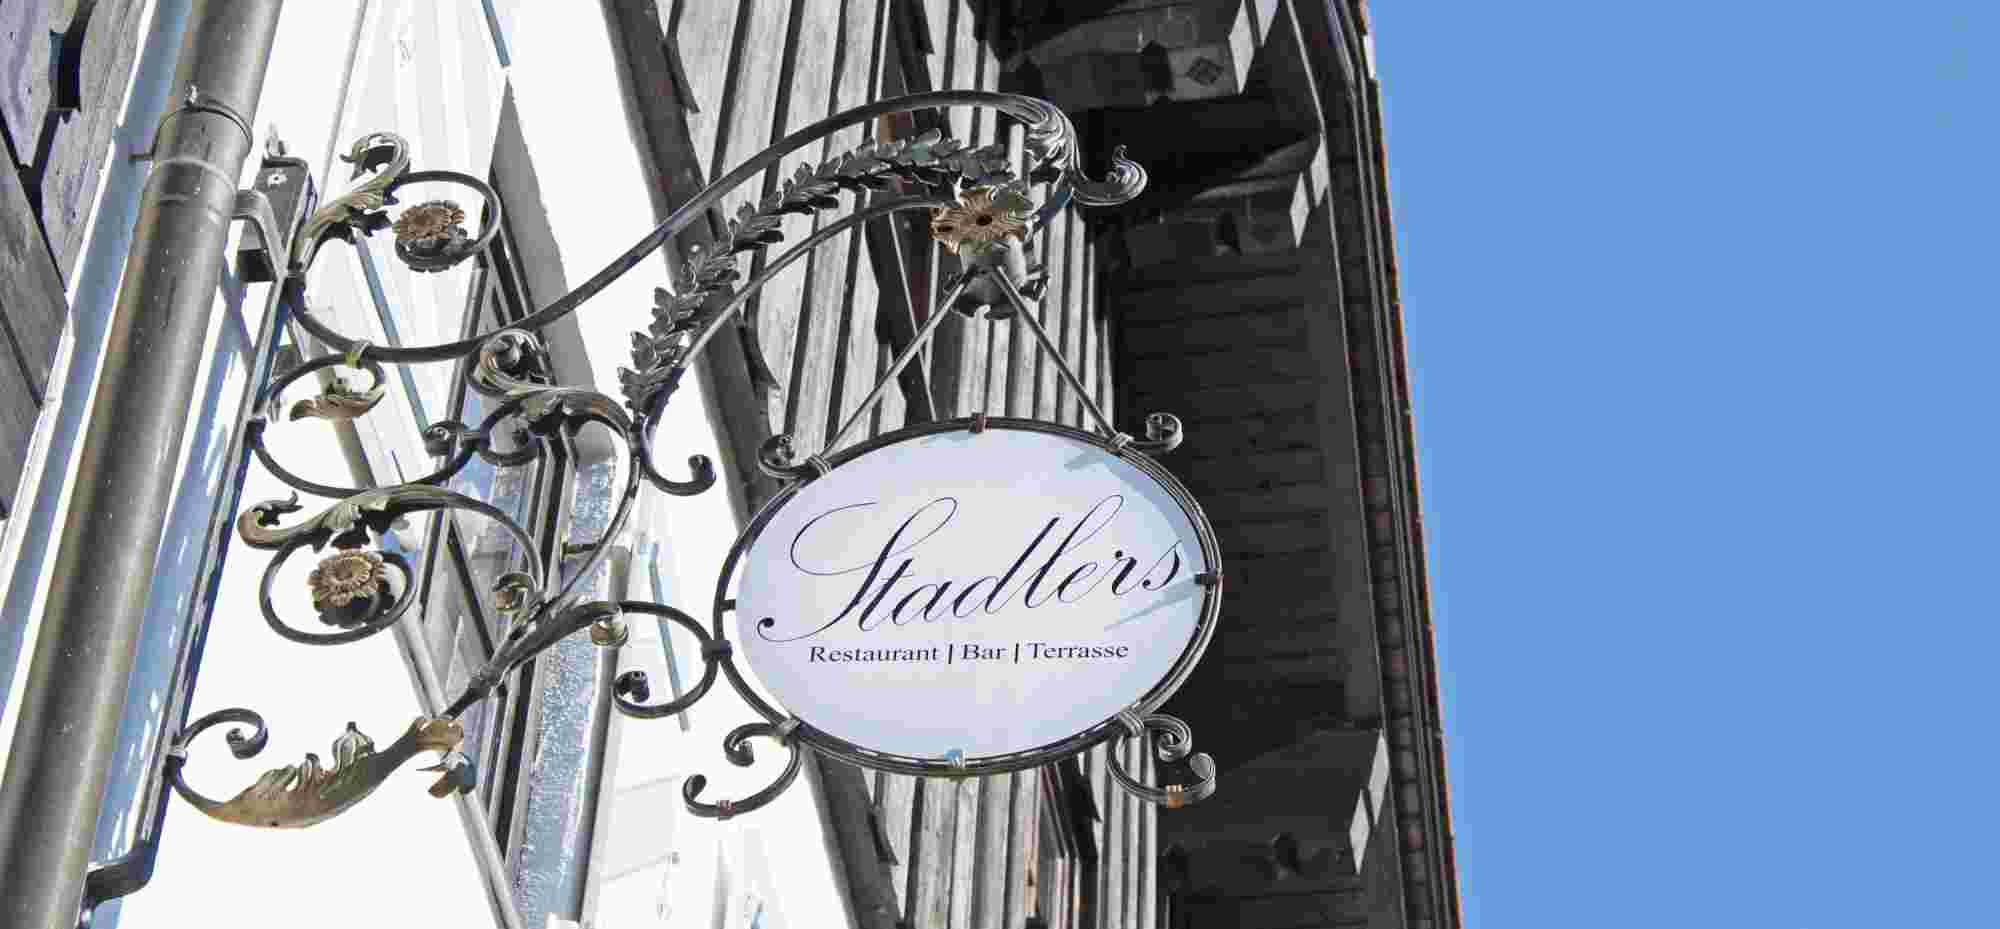 Stadlers Restaurant Oberstaufen